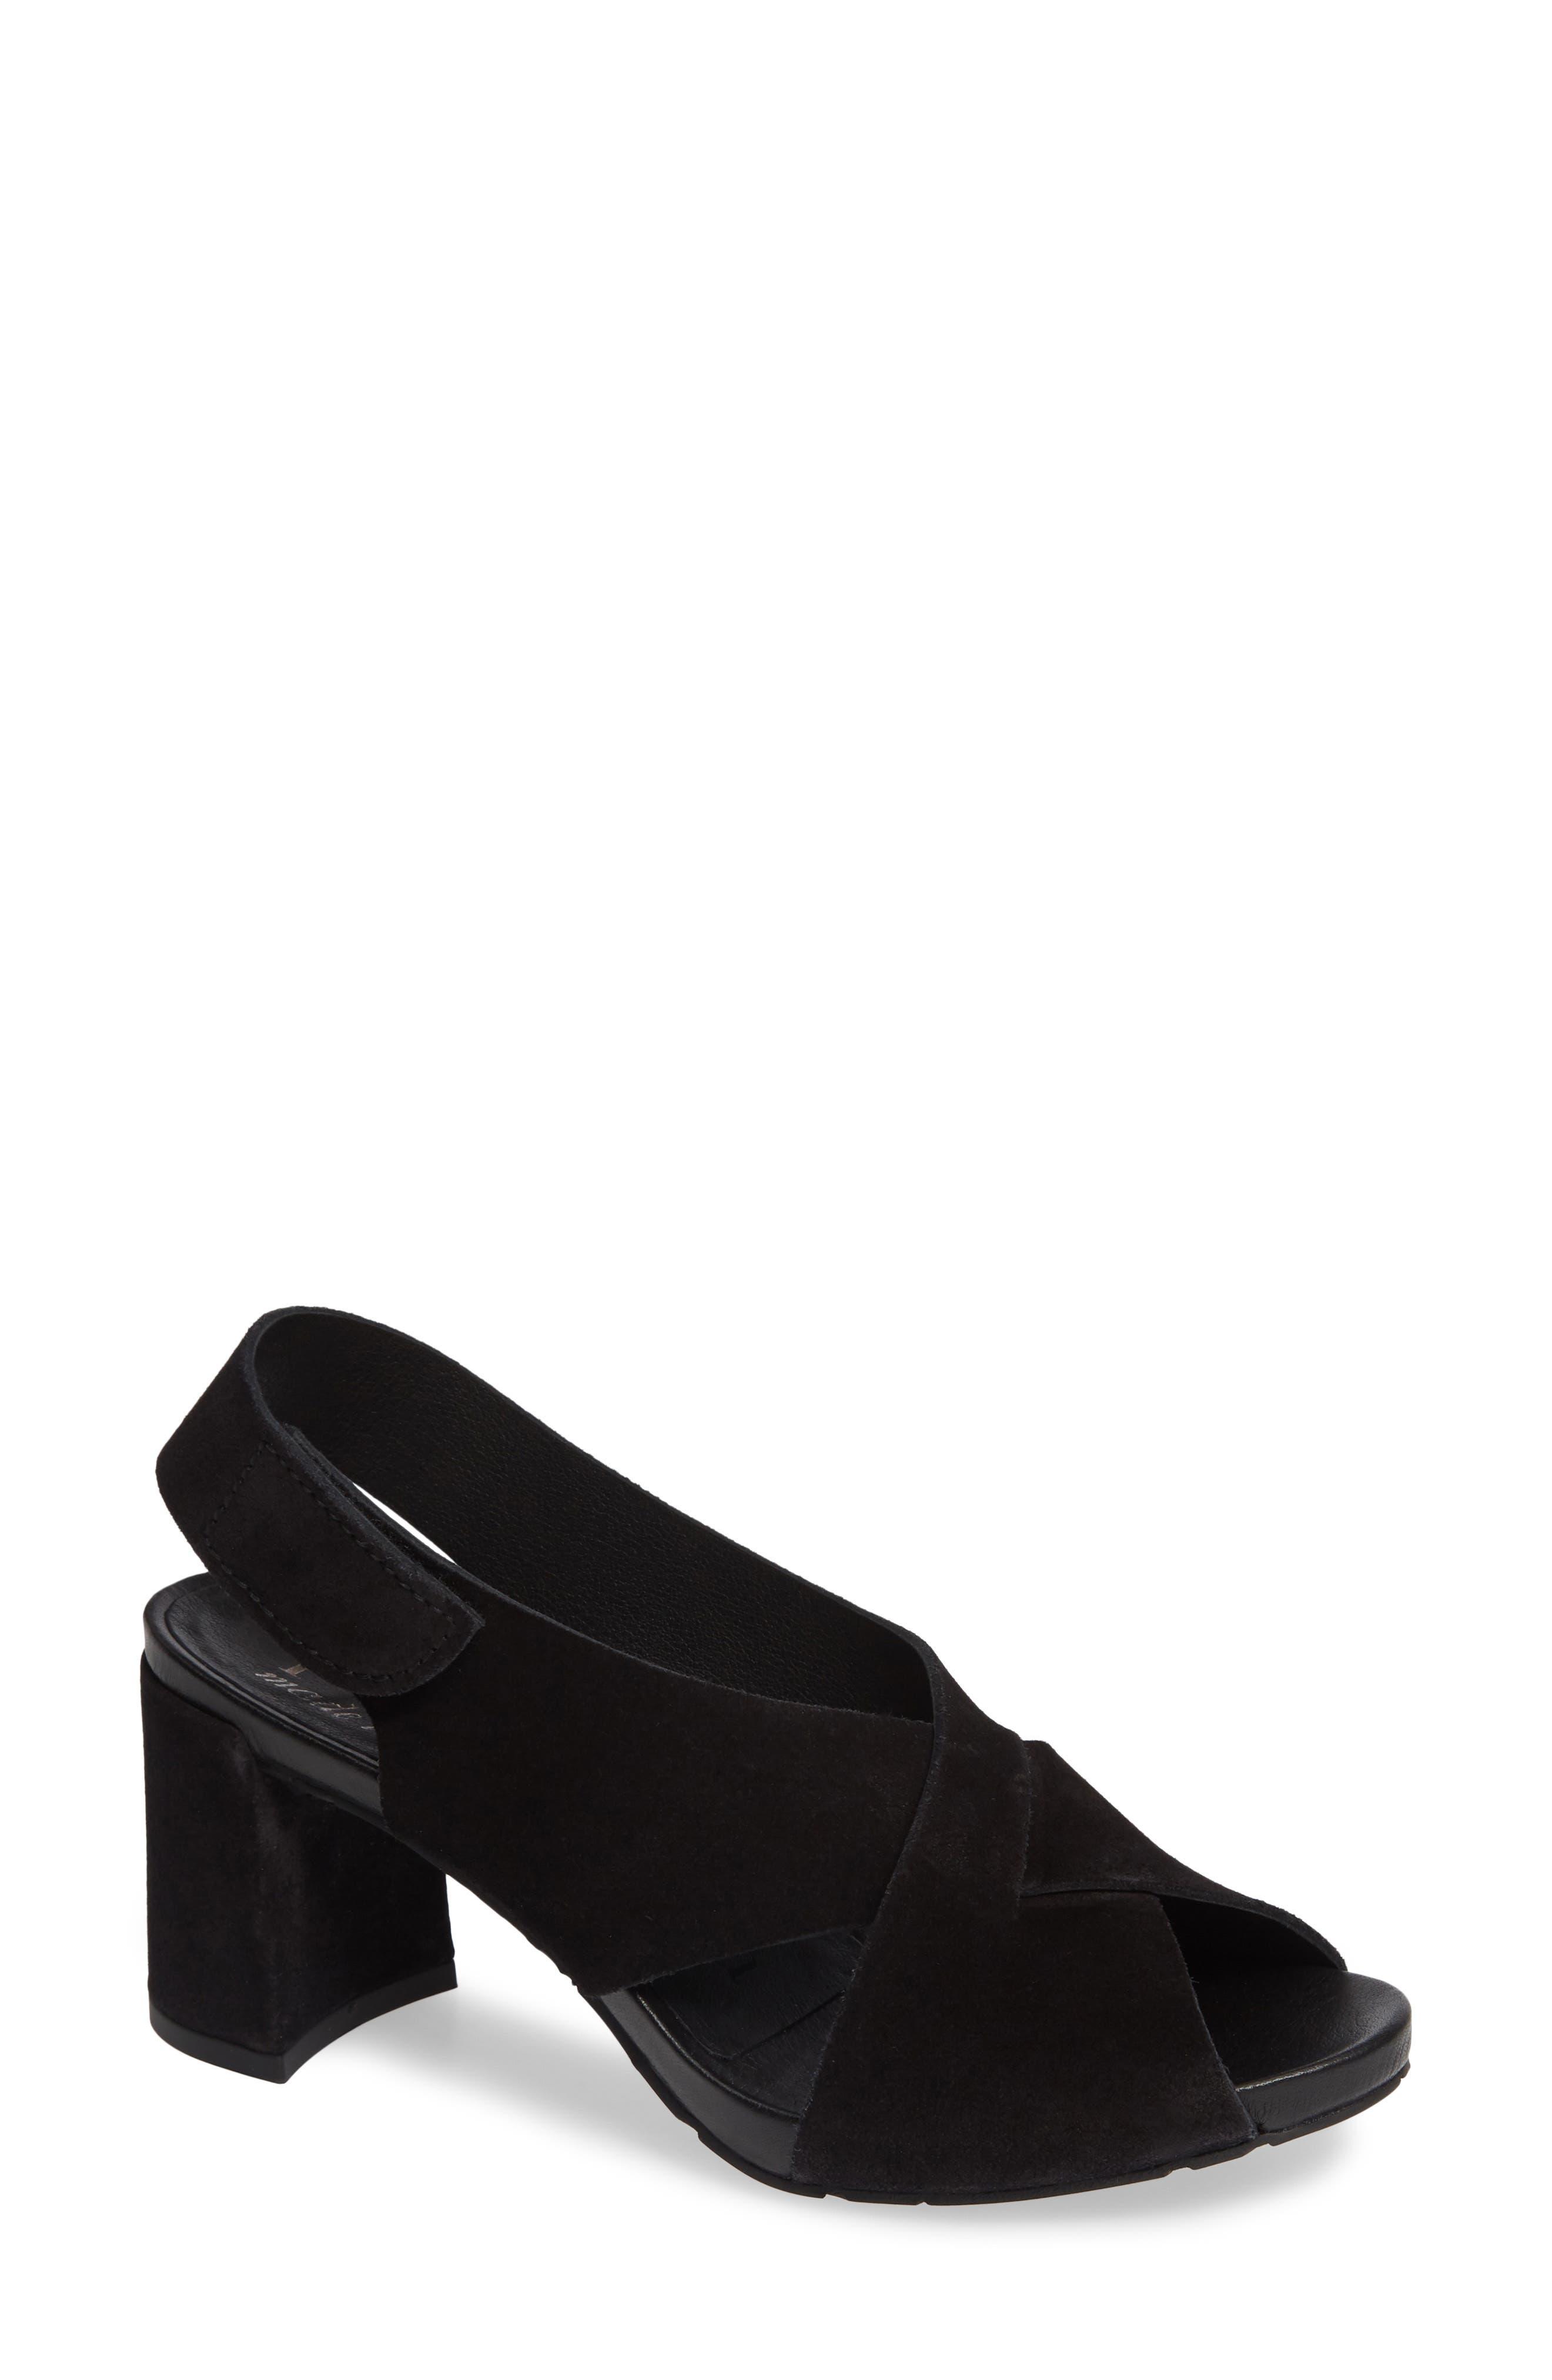 PEDRO GARCIA Wiela Slingback Sandal, Main, color, BLACK CASTORO